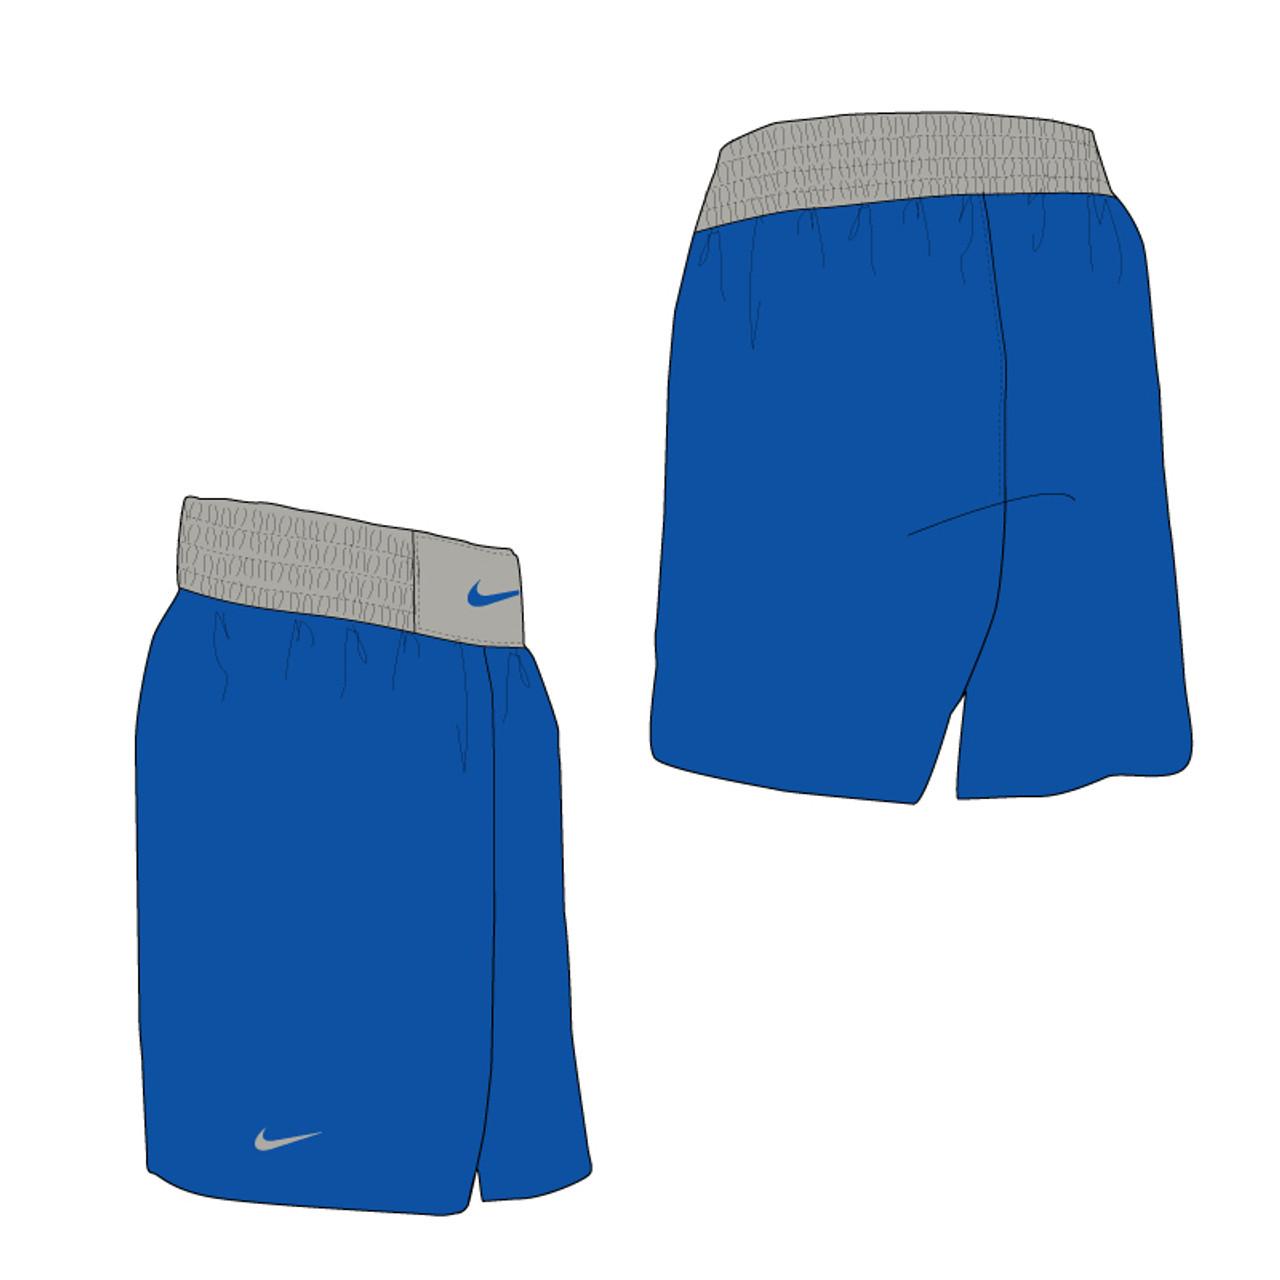 Athlete Nike Royal Performance Boxing Pewter Short Solutions Eu qTrPI8Twx